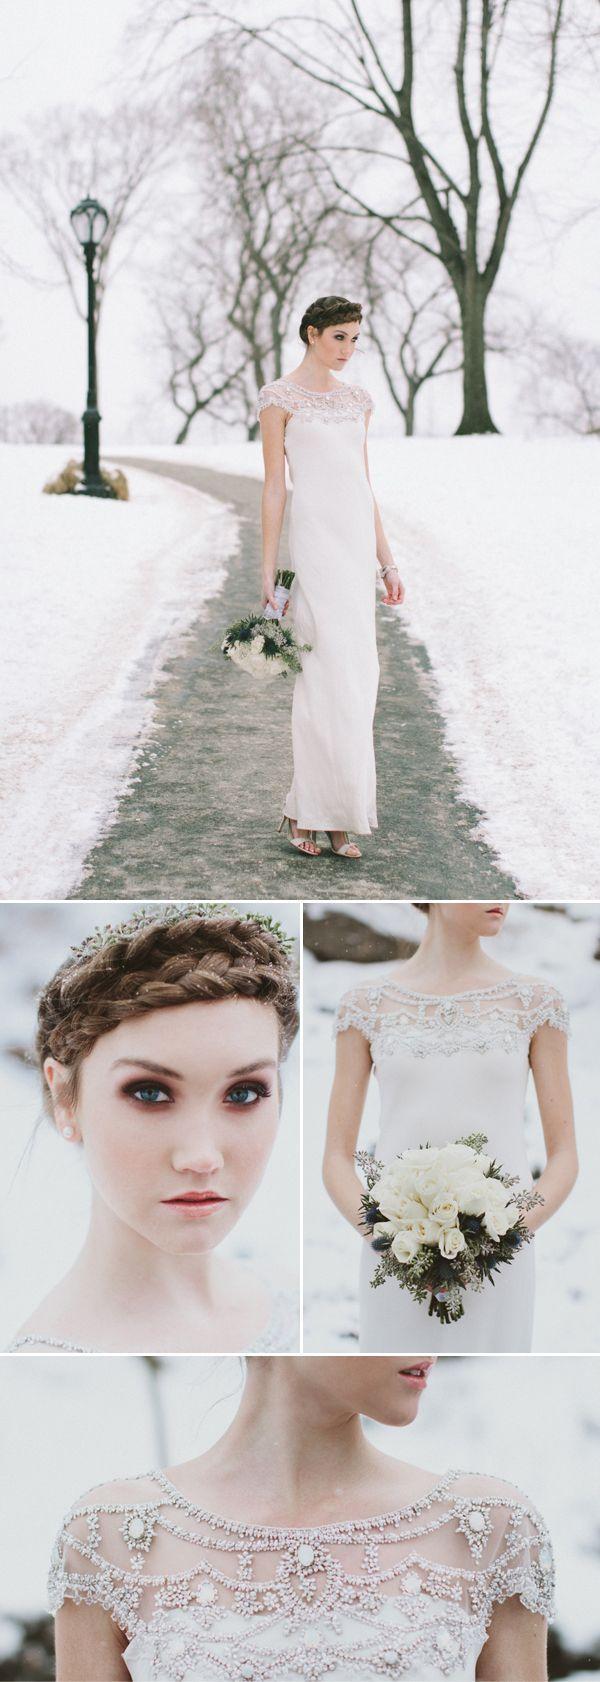 Wedding - Winter Wedding Inspiration